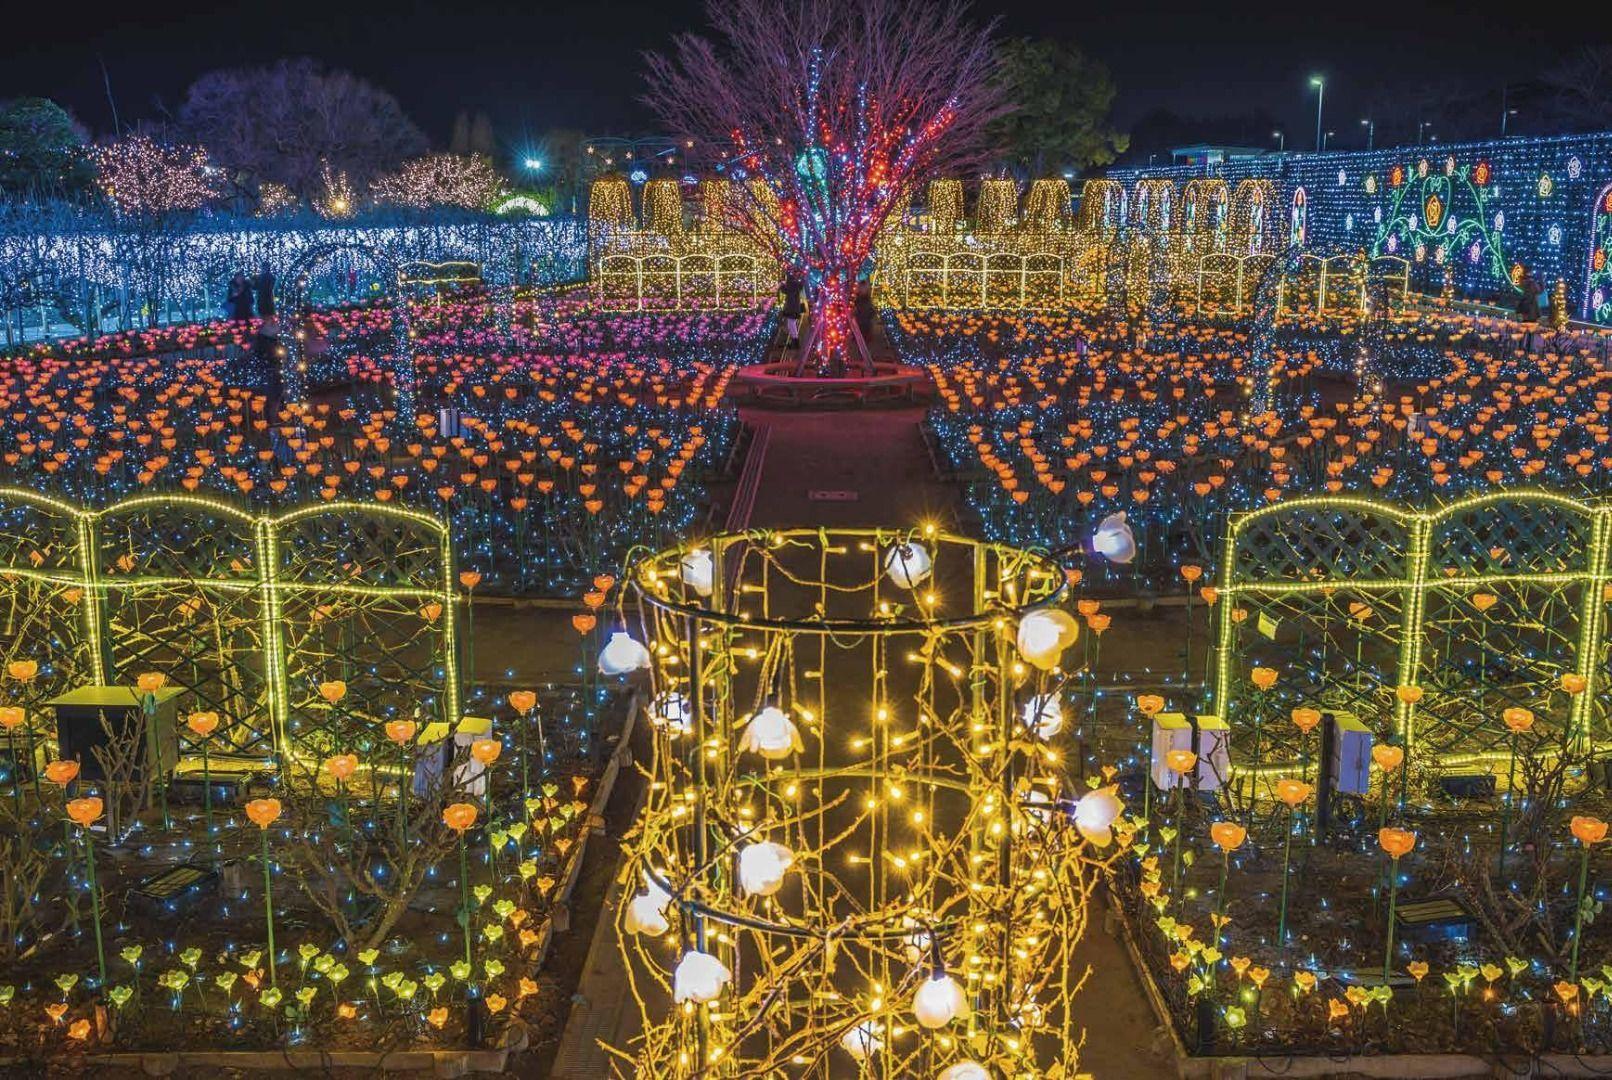 Winter Illuminations in Japan